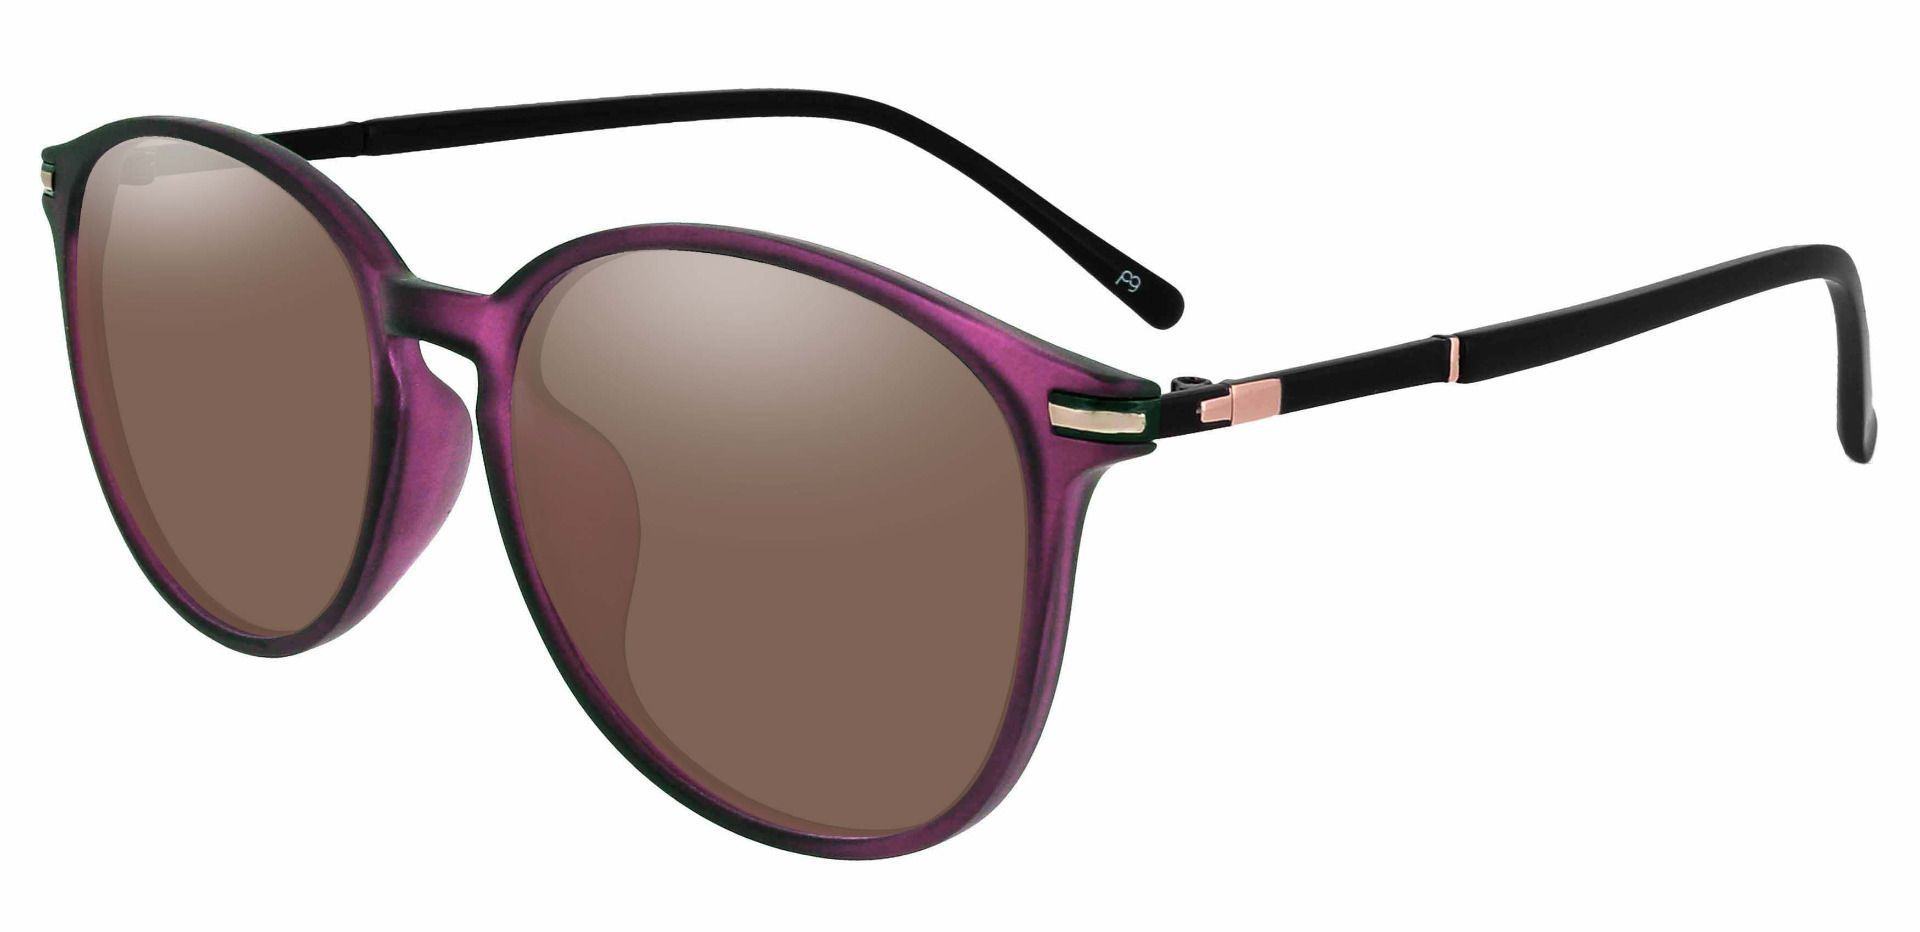 Danbury Oval Progressive Sunglasses - Purple Frame With Brown Lenses